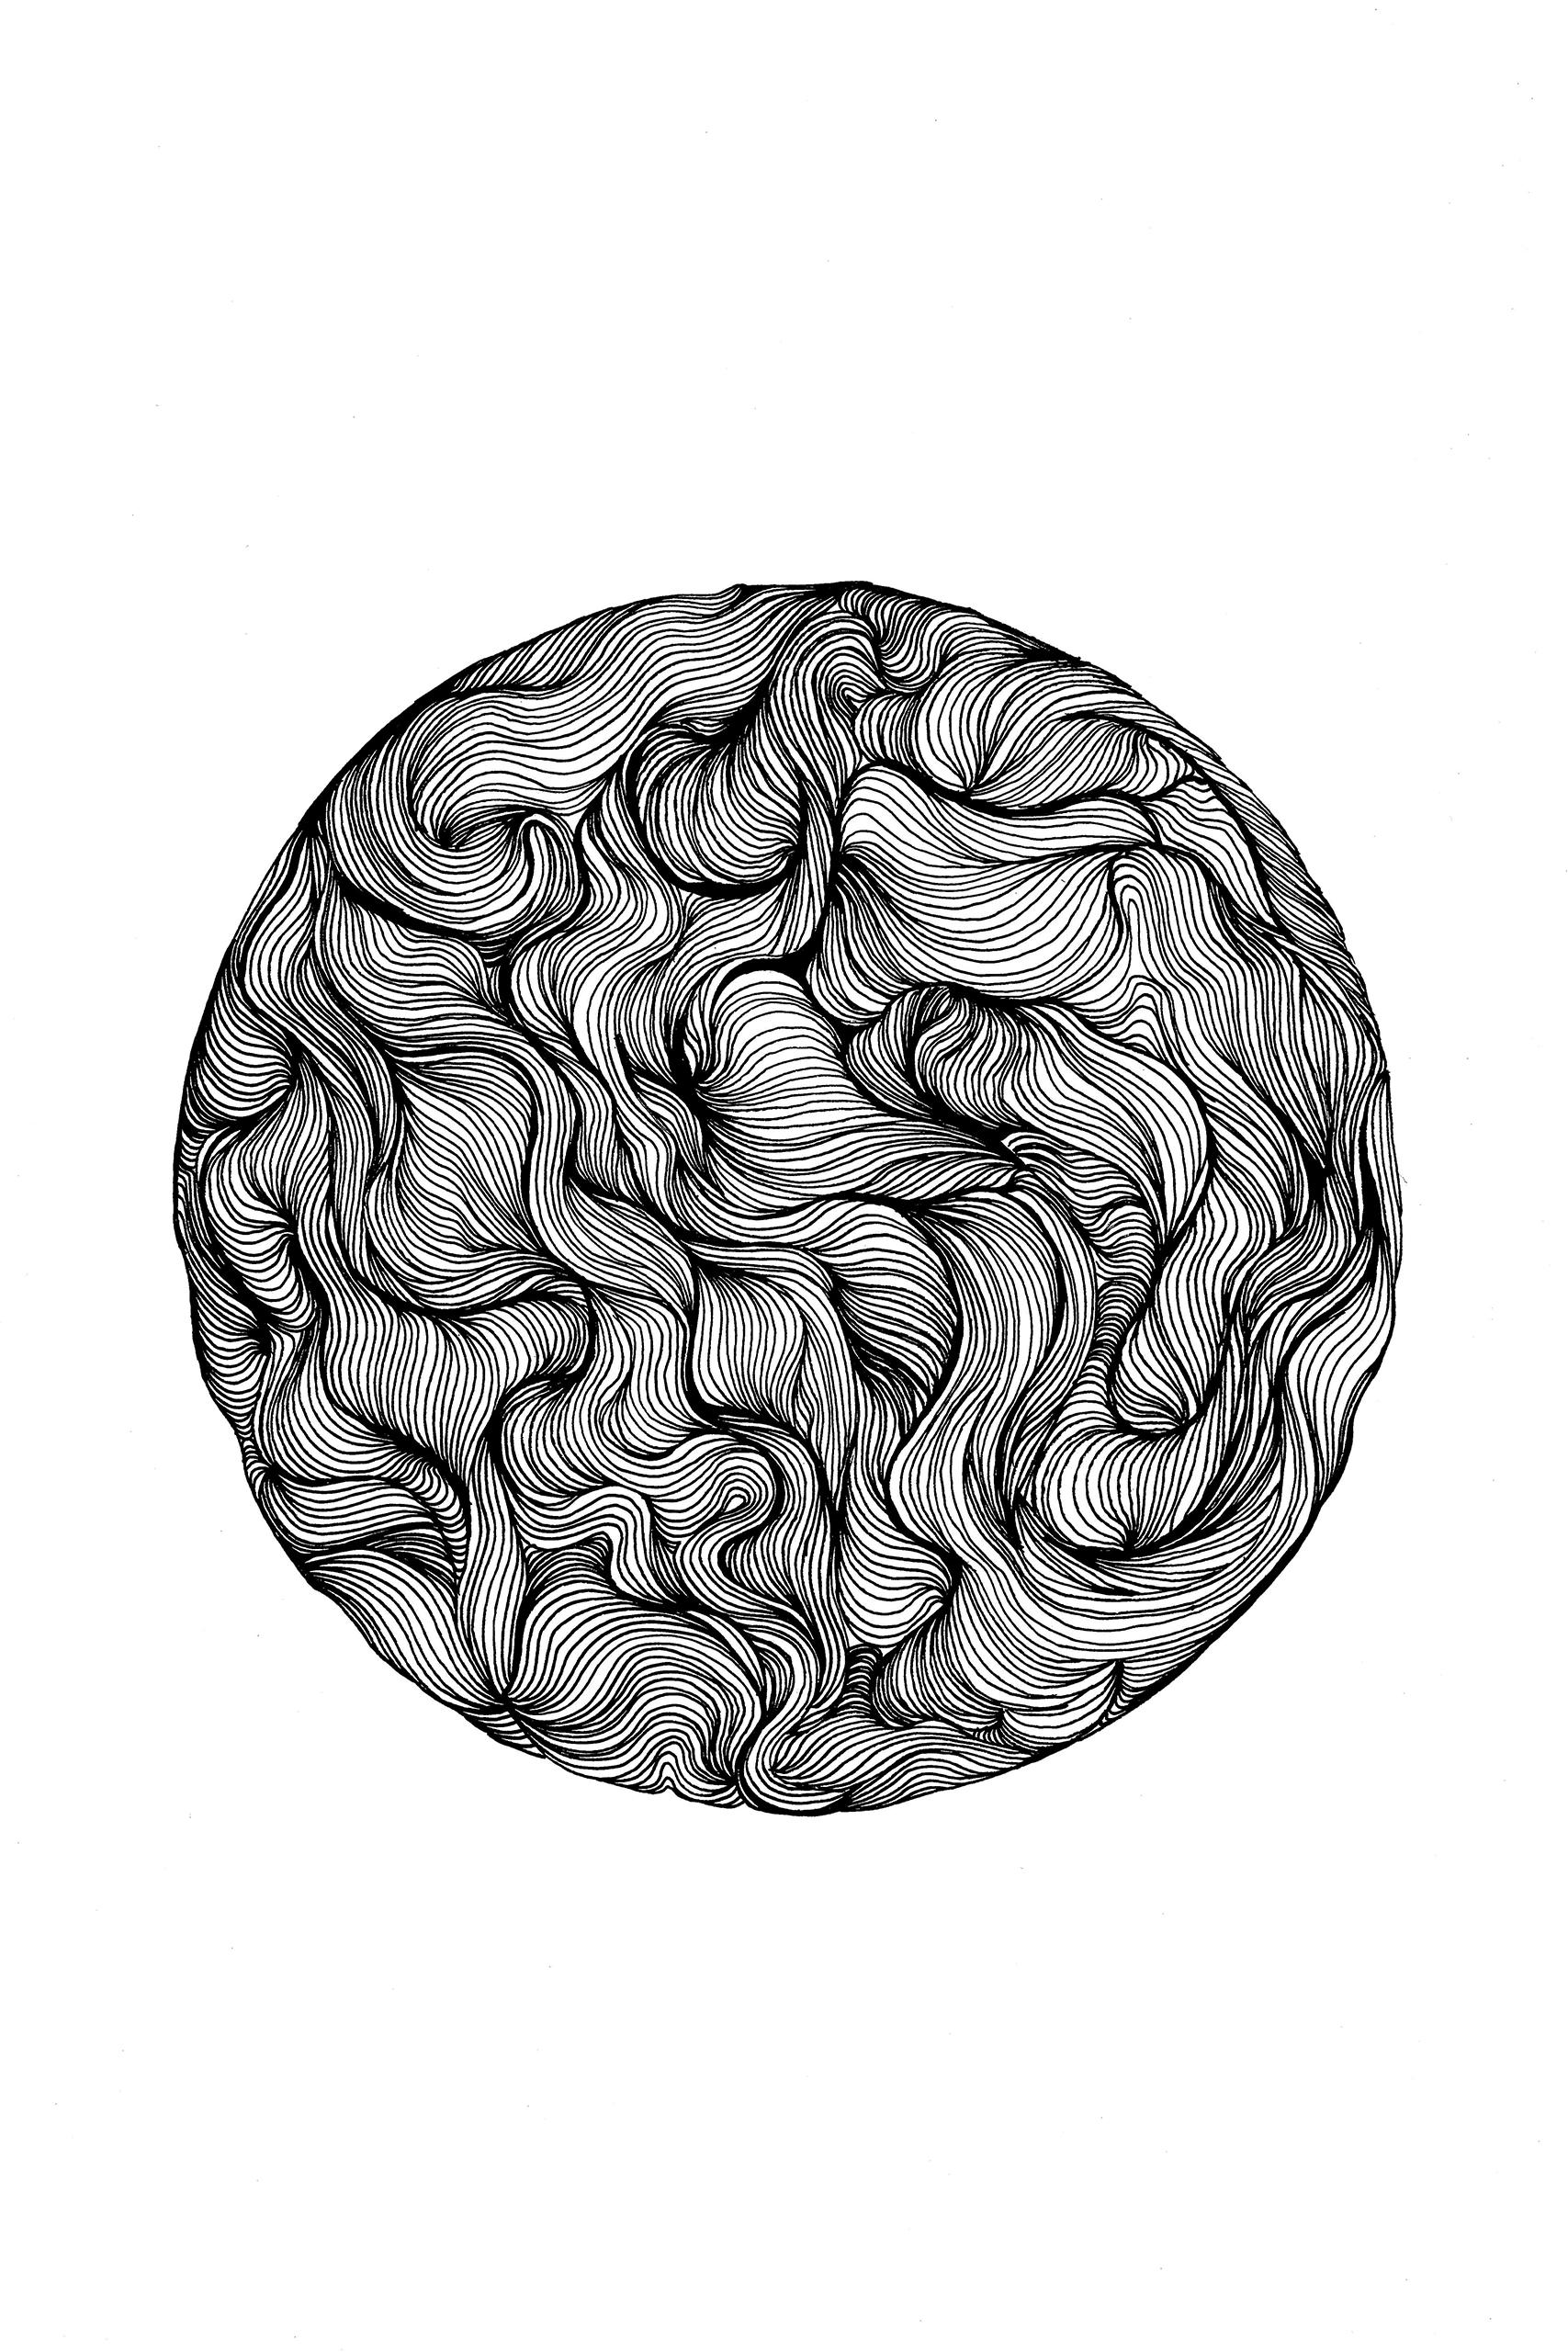 abysses_dessin_original_fihce_produit_songe_graphique